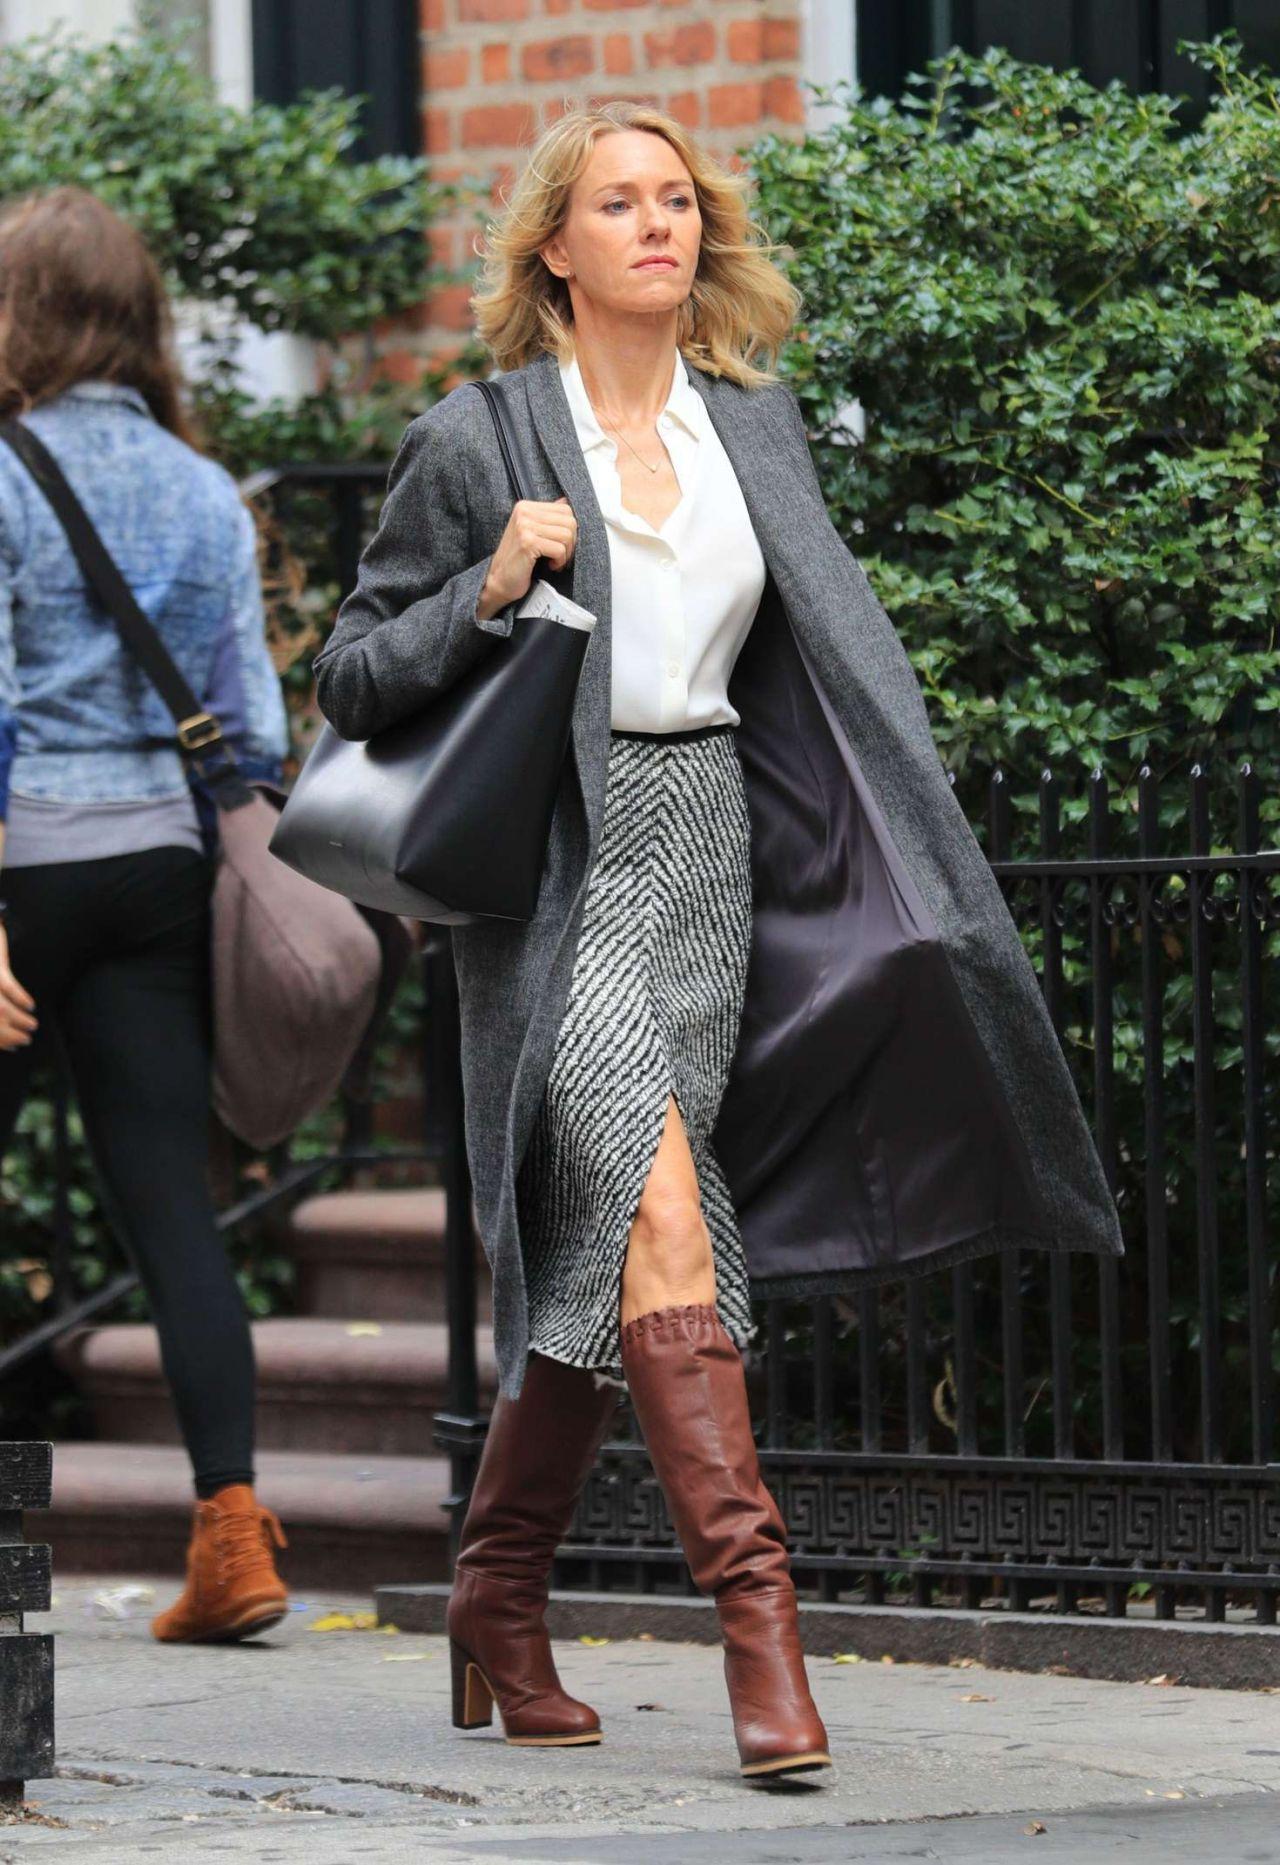 Naomi Watts Style And Fashion Inspirations Nyc 9 28 2016